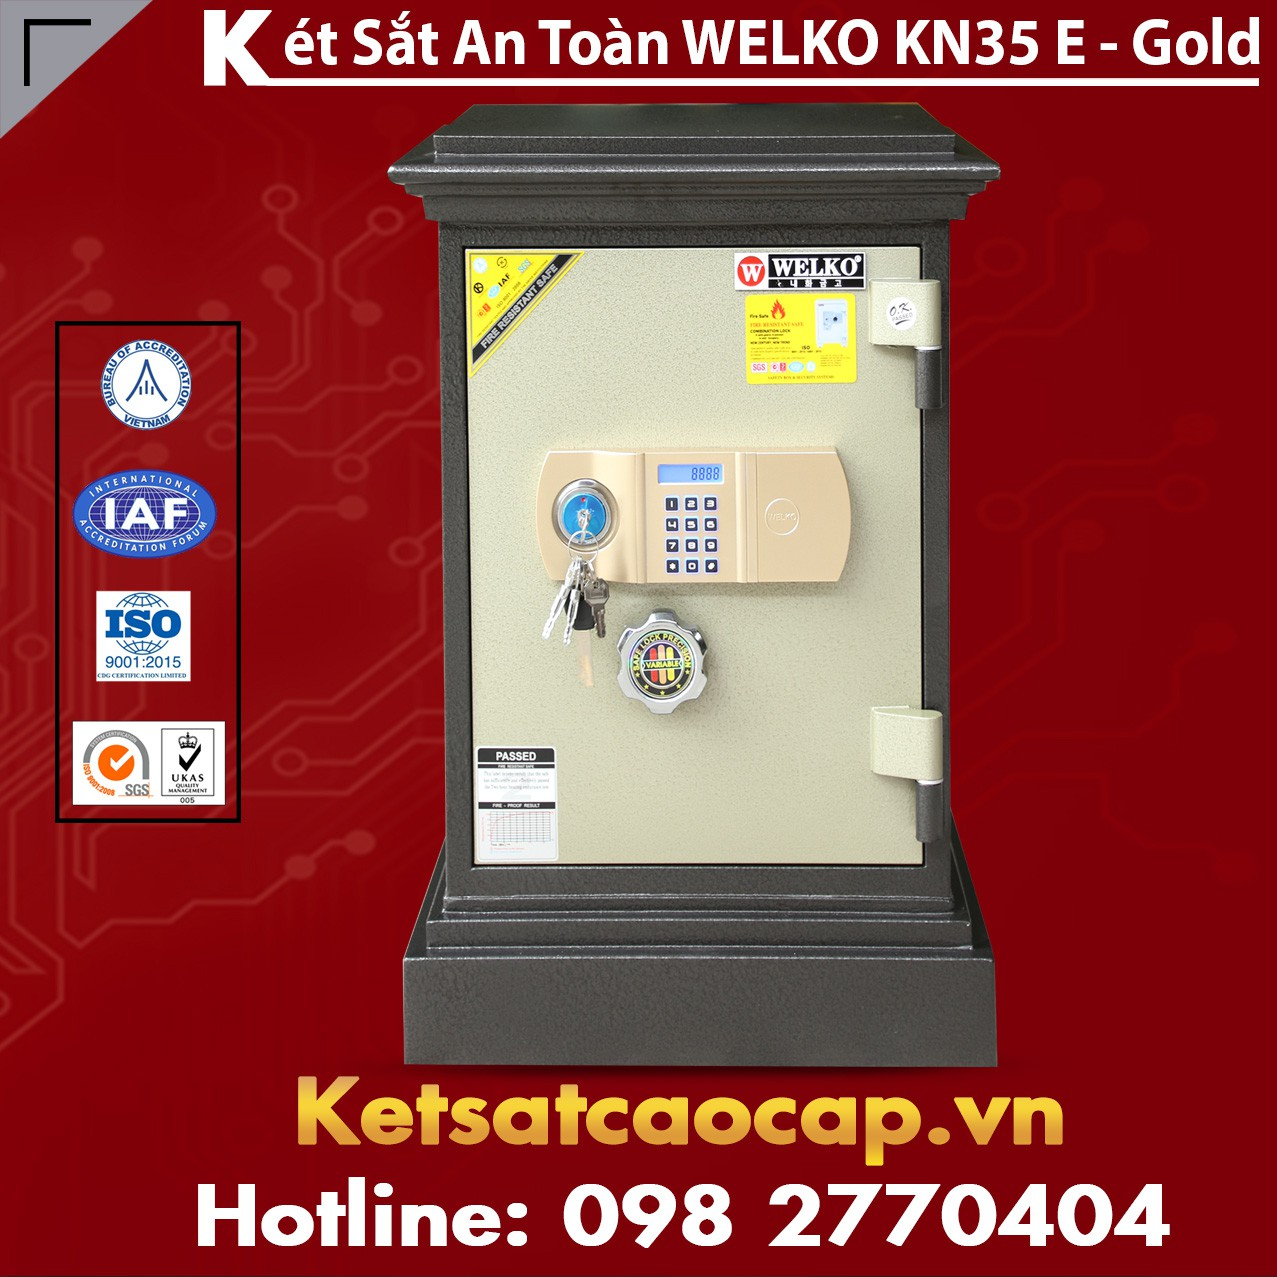 Két Sắt Đặt Theo Yêu Cầu WELKO KN35 Black E Gold